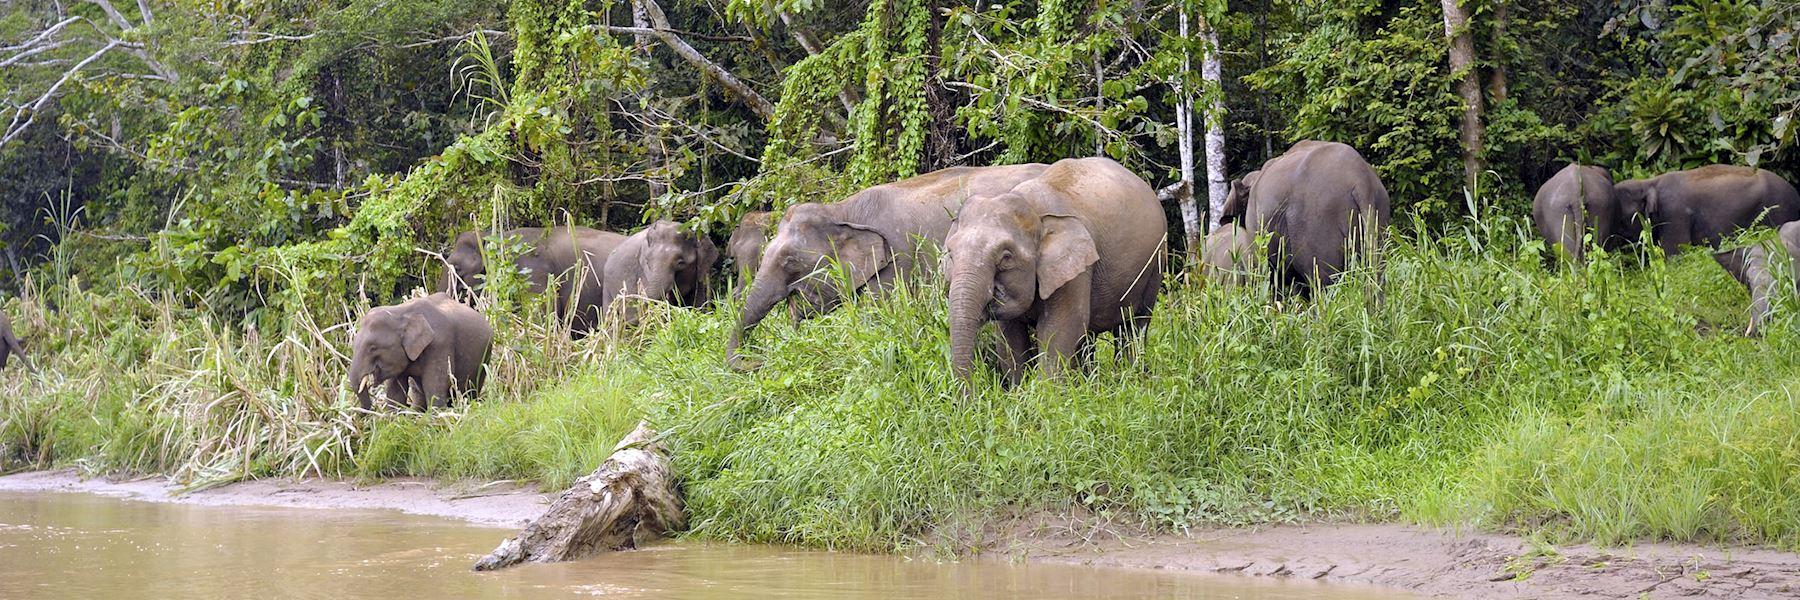 Visit Tabin Wildlife Reserve, Borneo